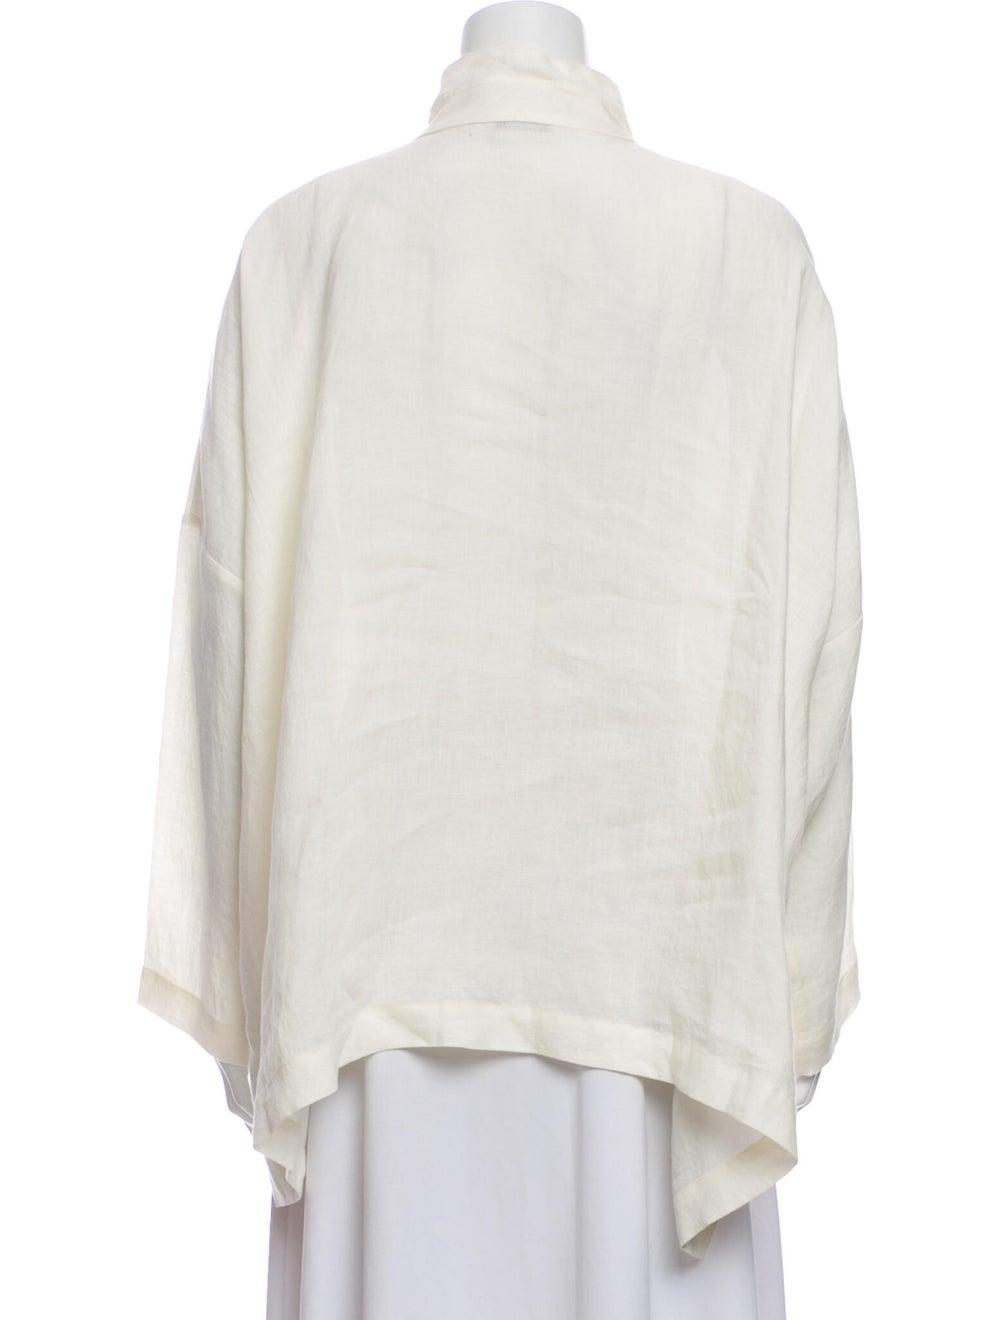 Eskandar Linen Mock Neck Sweatshirt - image 3